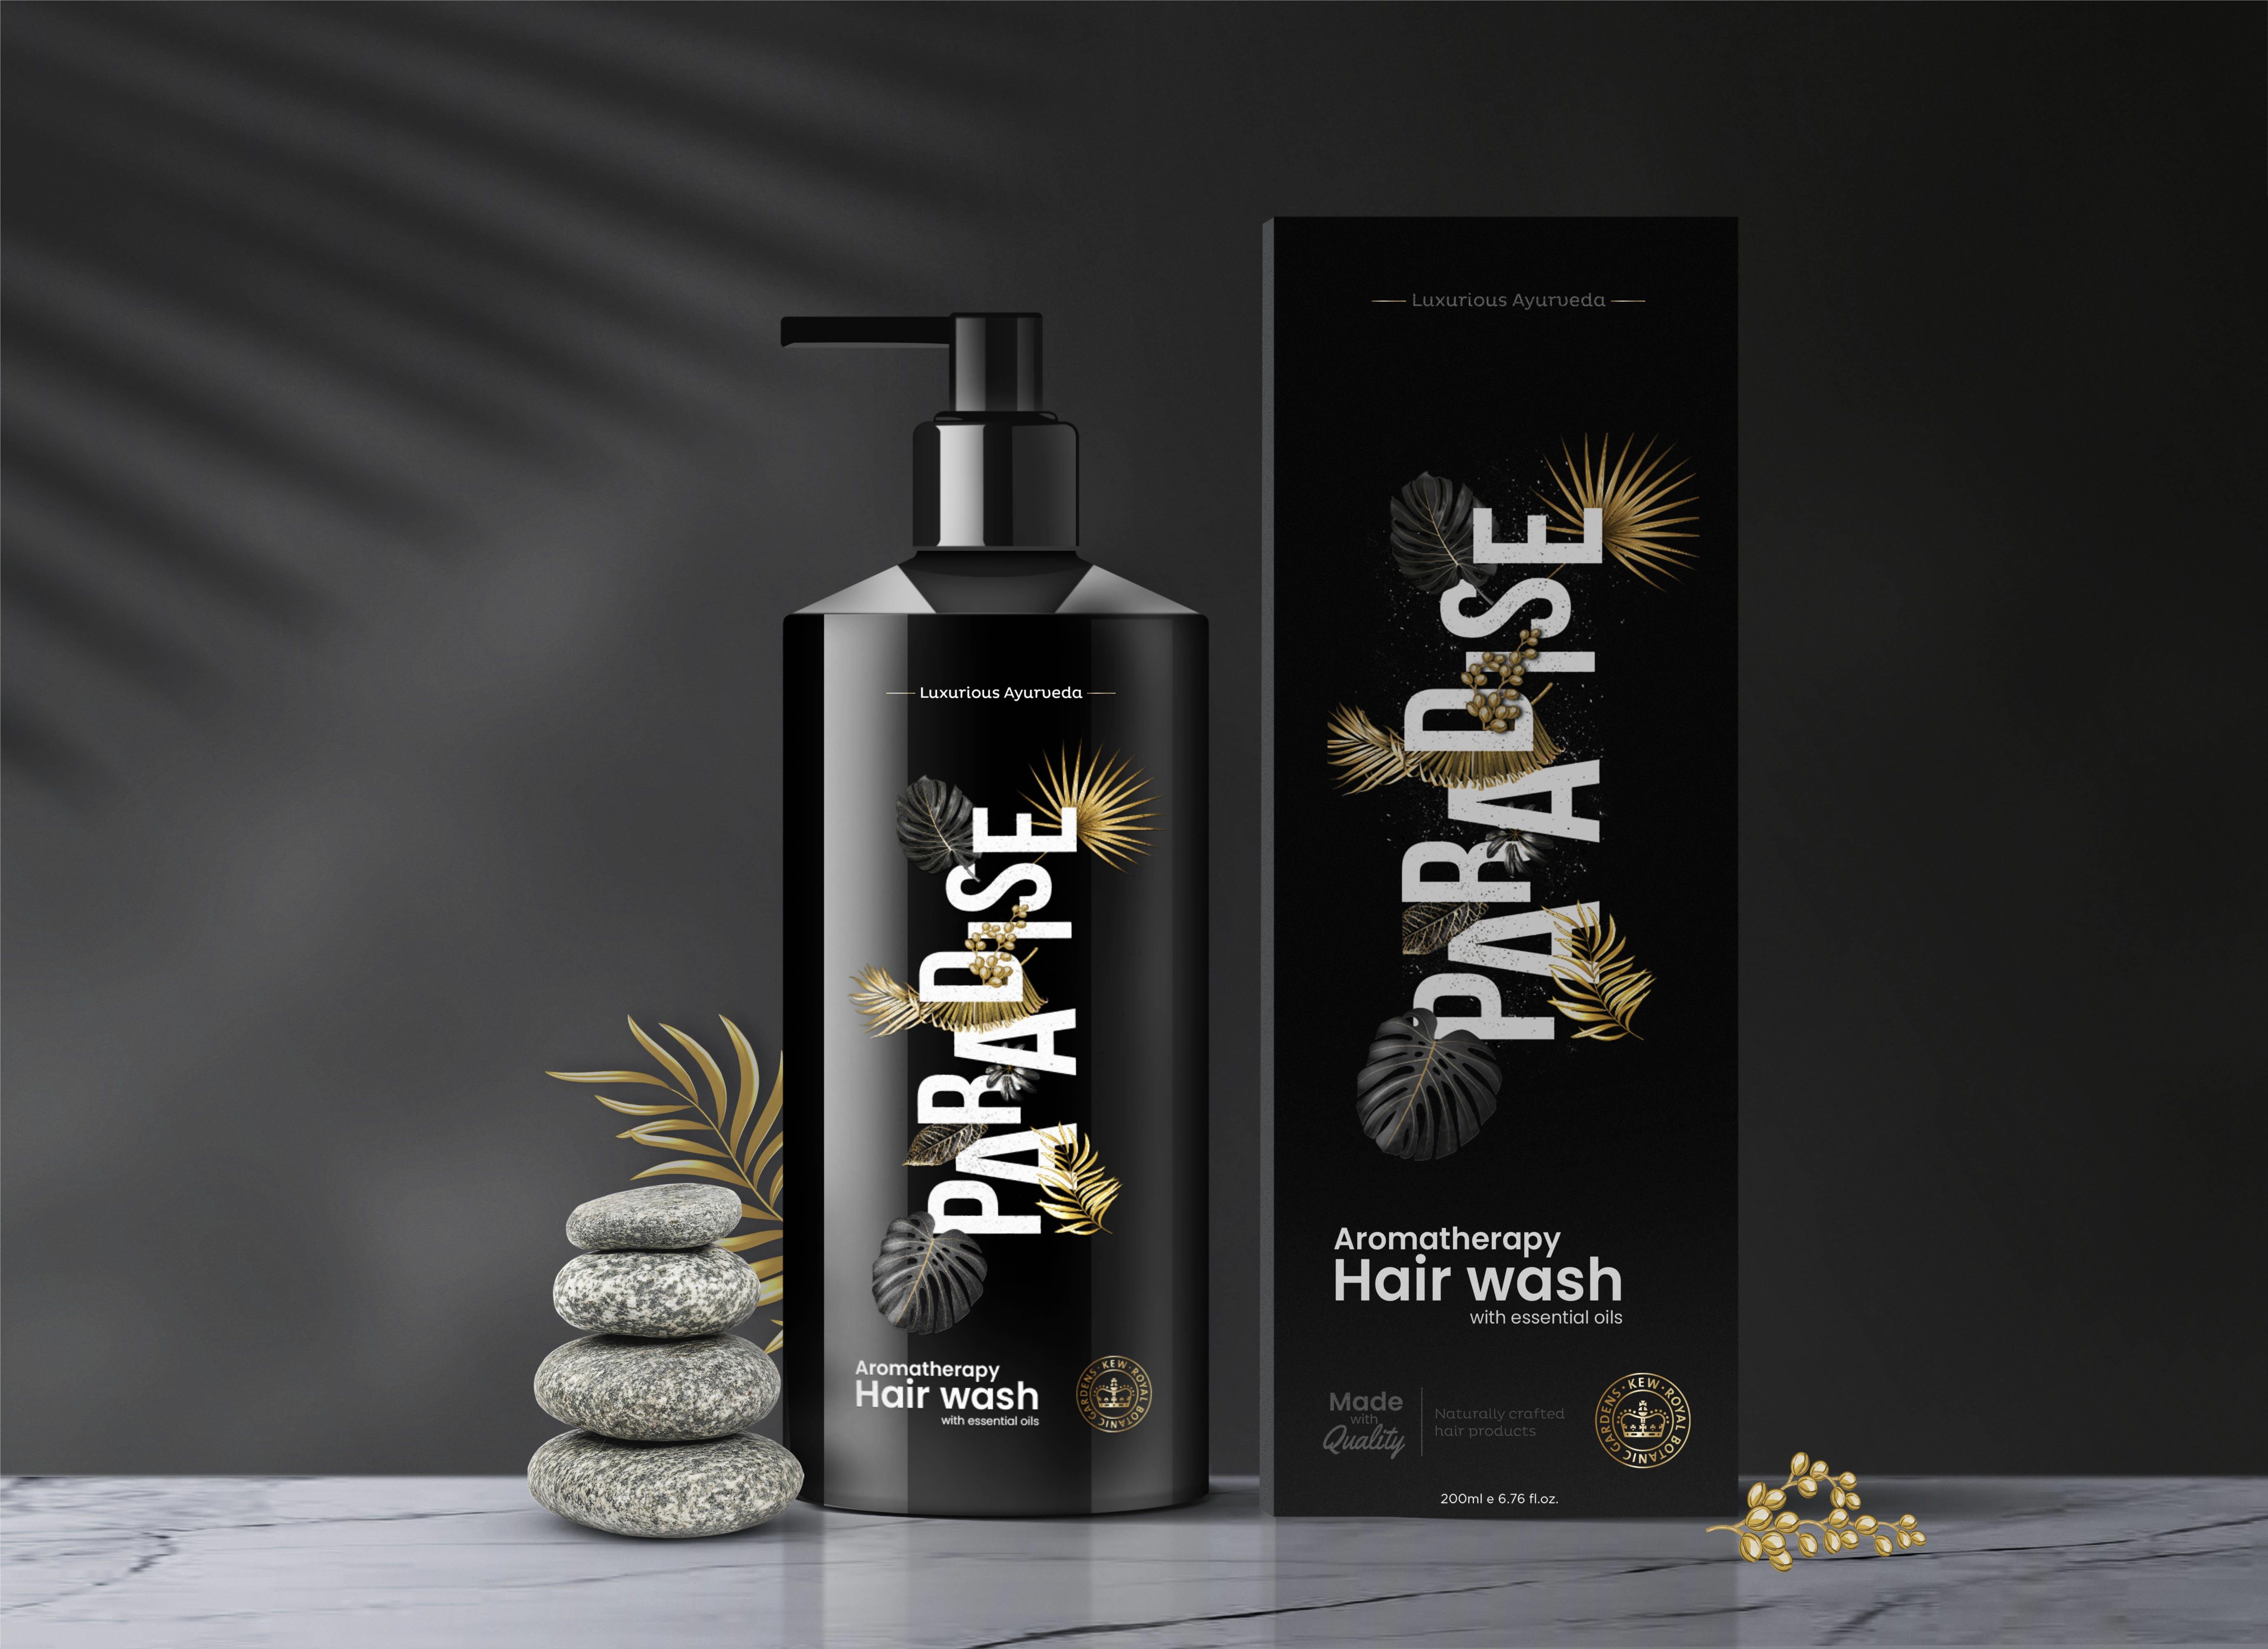 A Concept for Luxury Skincare Brand by Rachita Karnik